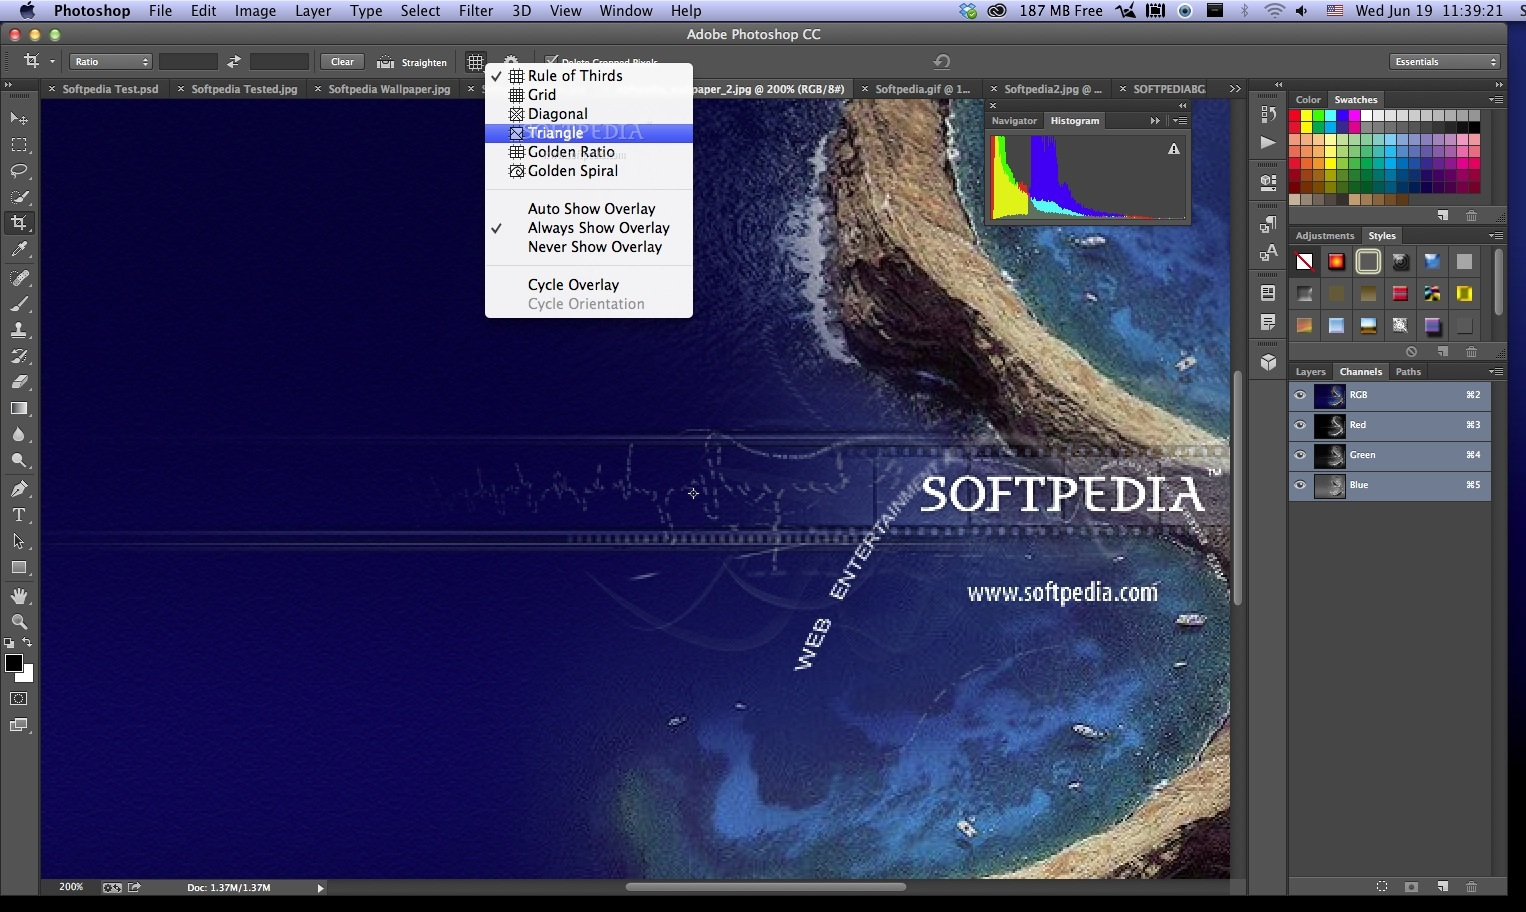 Adobe Photoshop Mac CC 2019 20 0 5 - Download